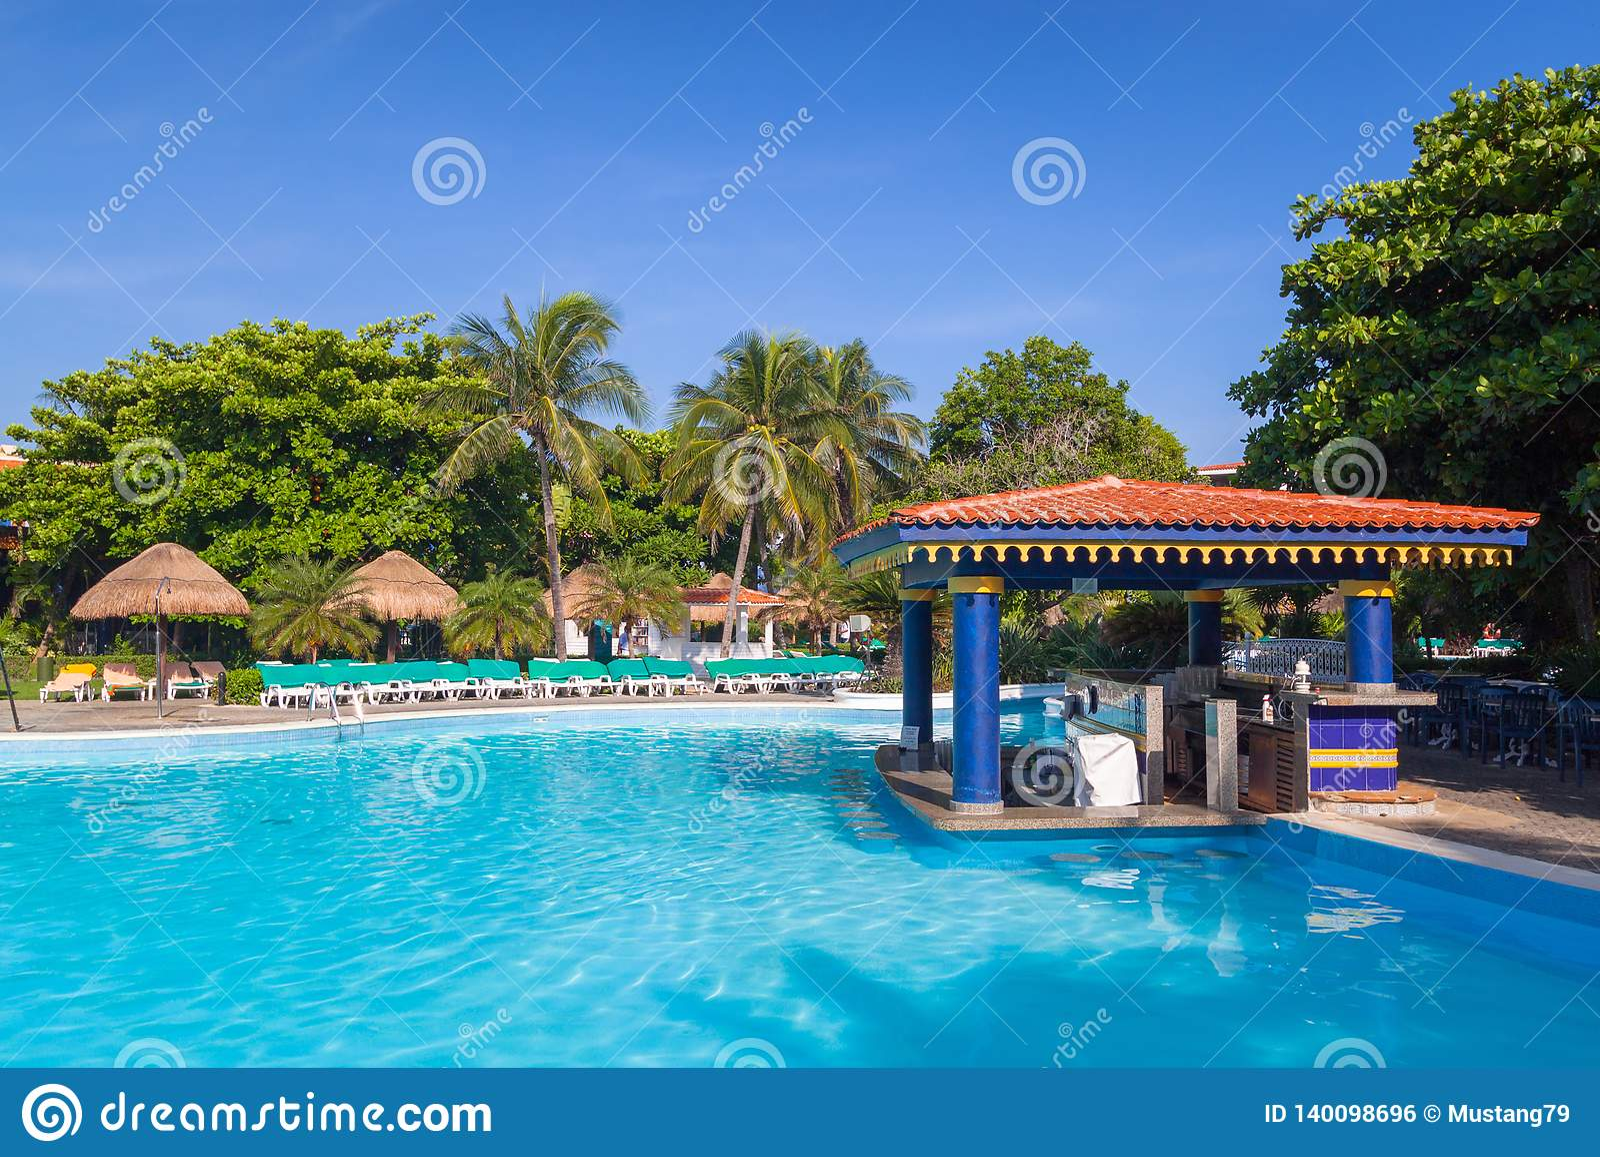 Scenery Of Luxury Swimming Pool At Riu Tequila Hotel In Playa Del